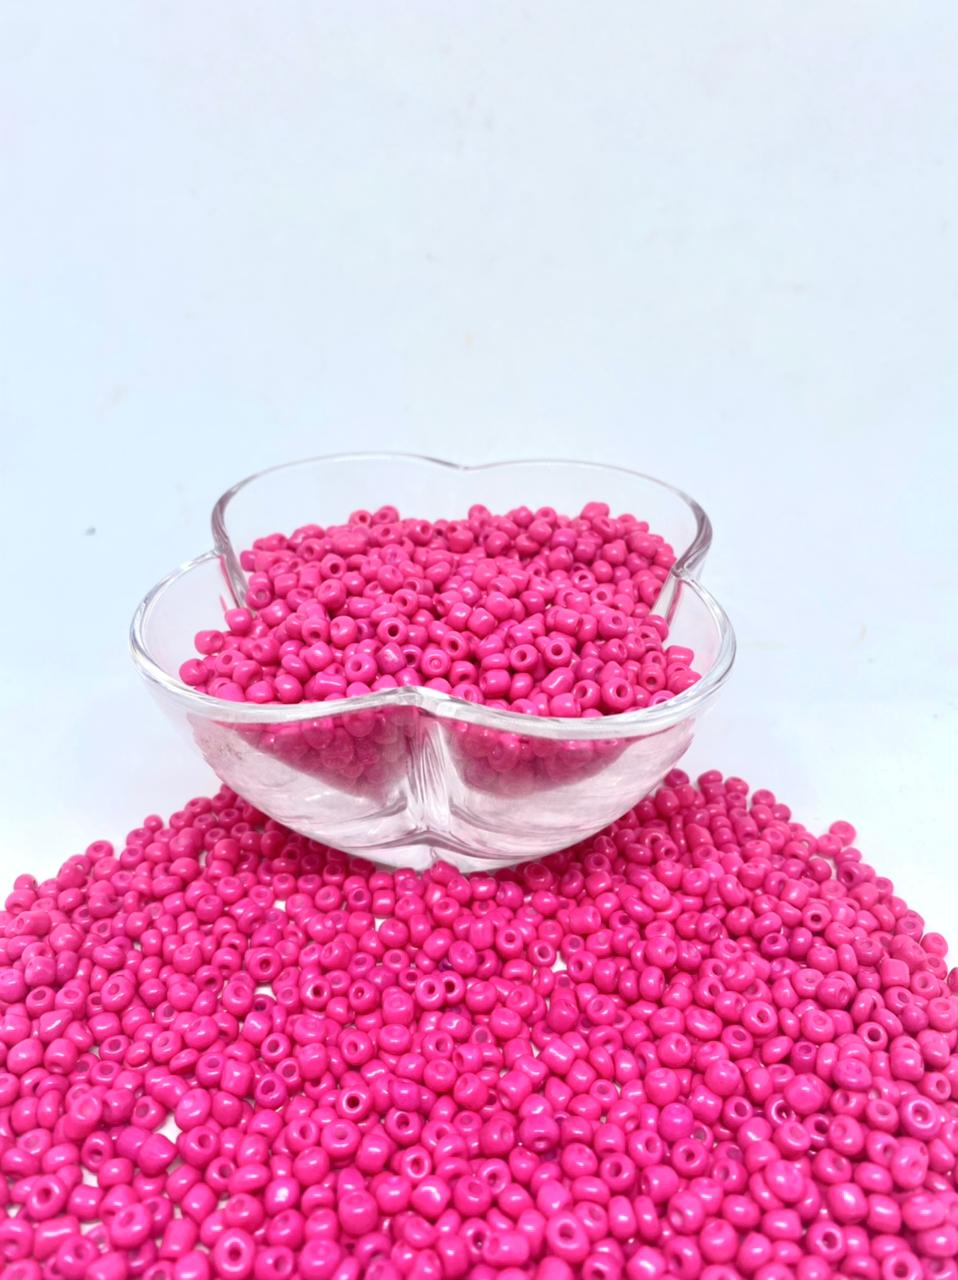 Miçangão rosa 4.1mm (6/0) 25g